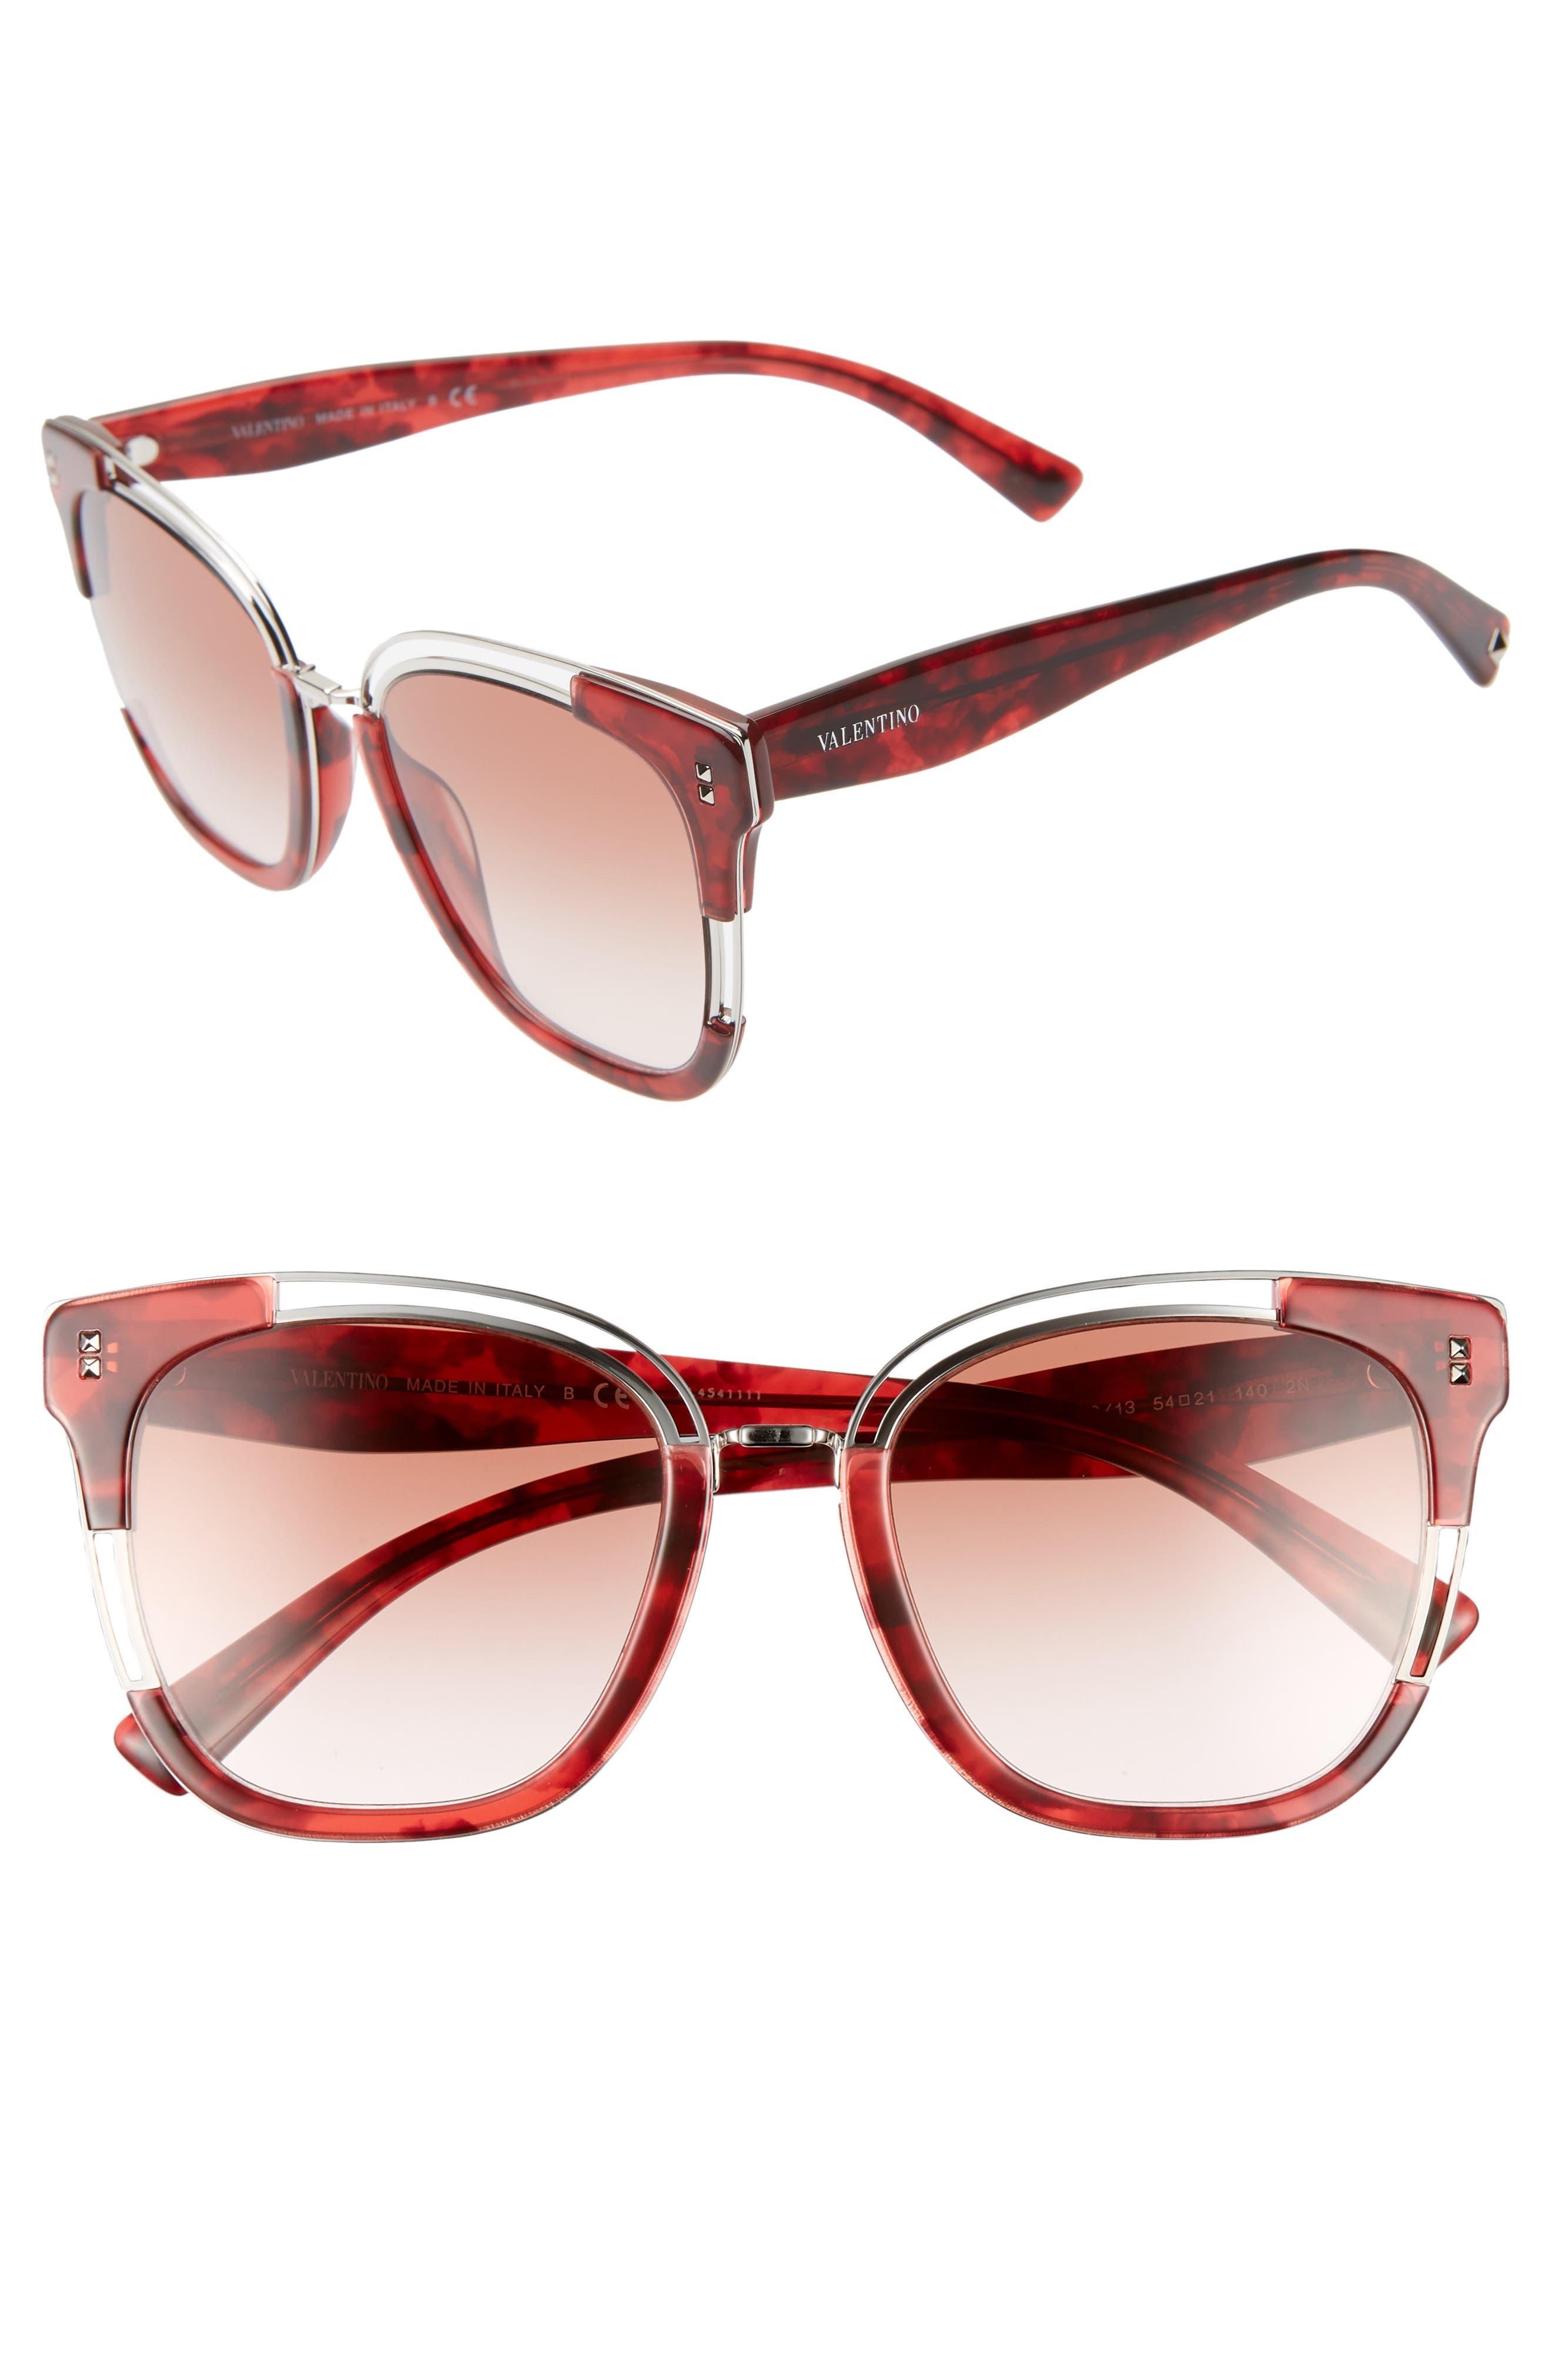 Valentino 5m Square Sunglasses - Red Havana/ Brown Gradient